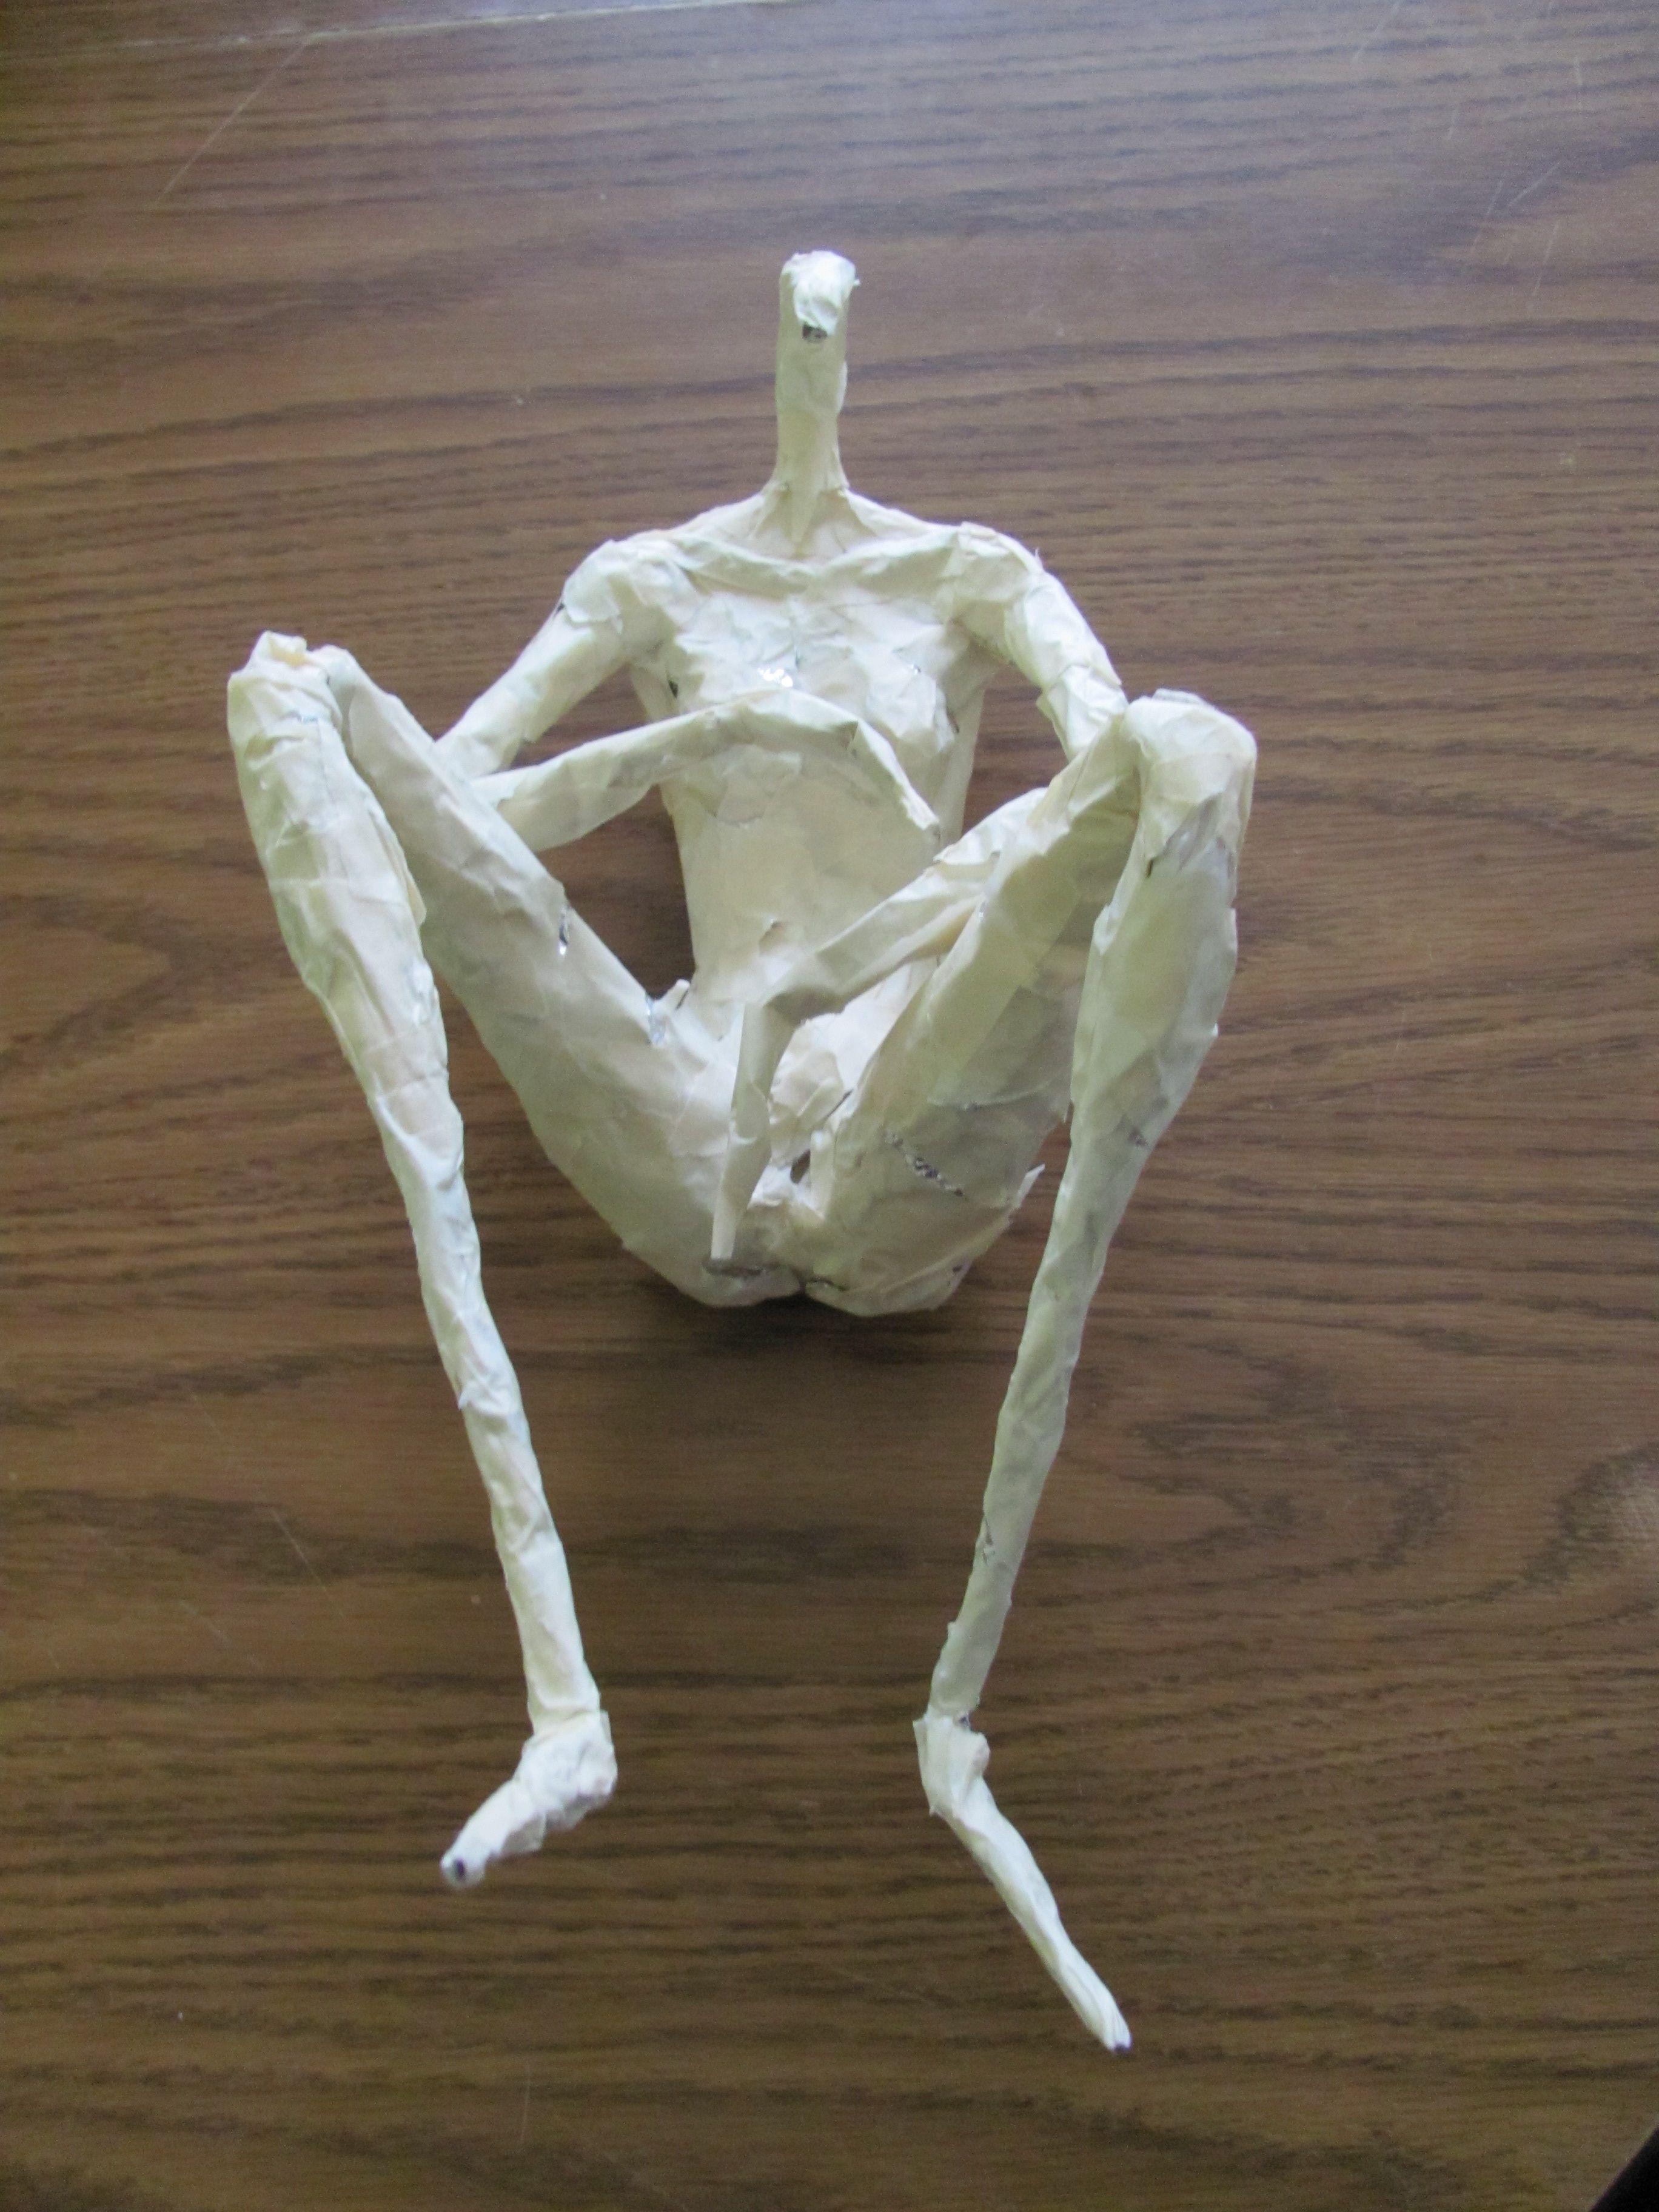 sculpture the probe papier mache google search and paper sculptures. Black Bedroom Furniture Sets. Home Design Ideas